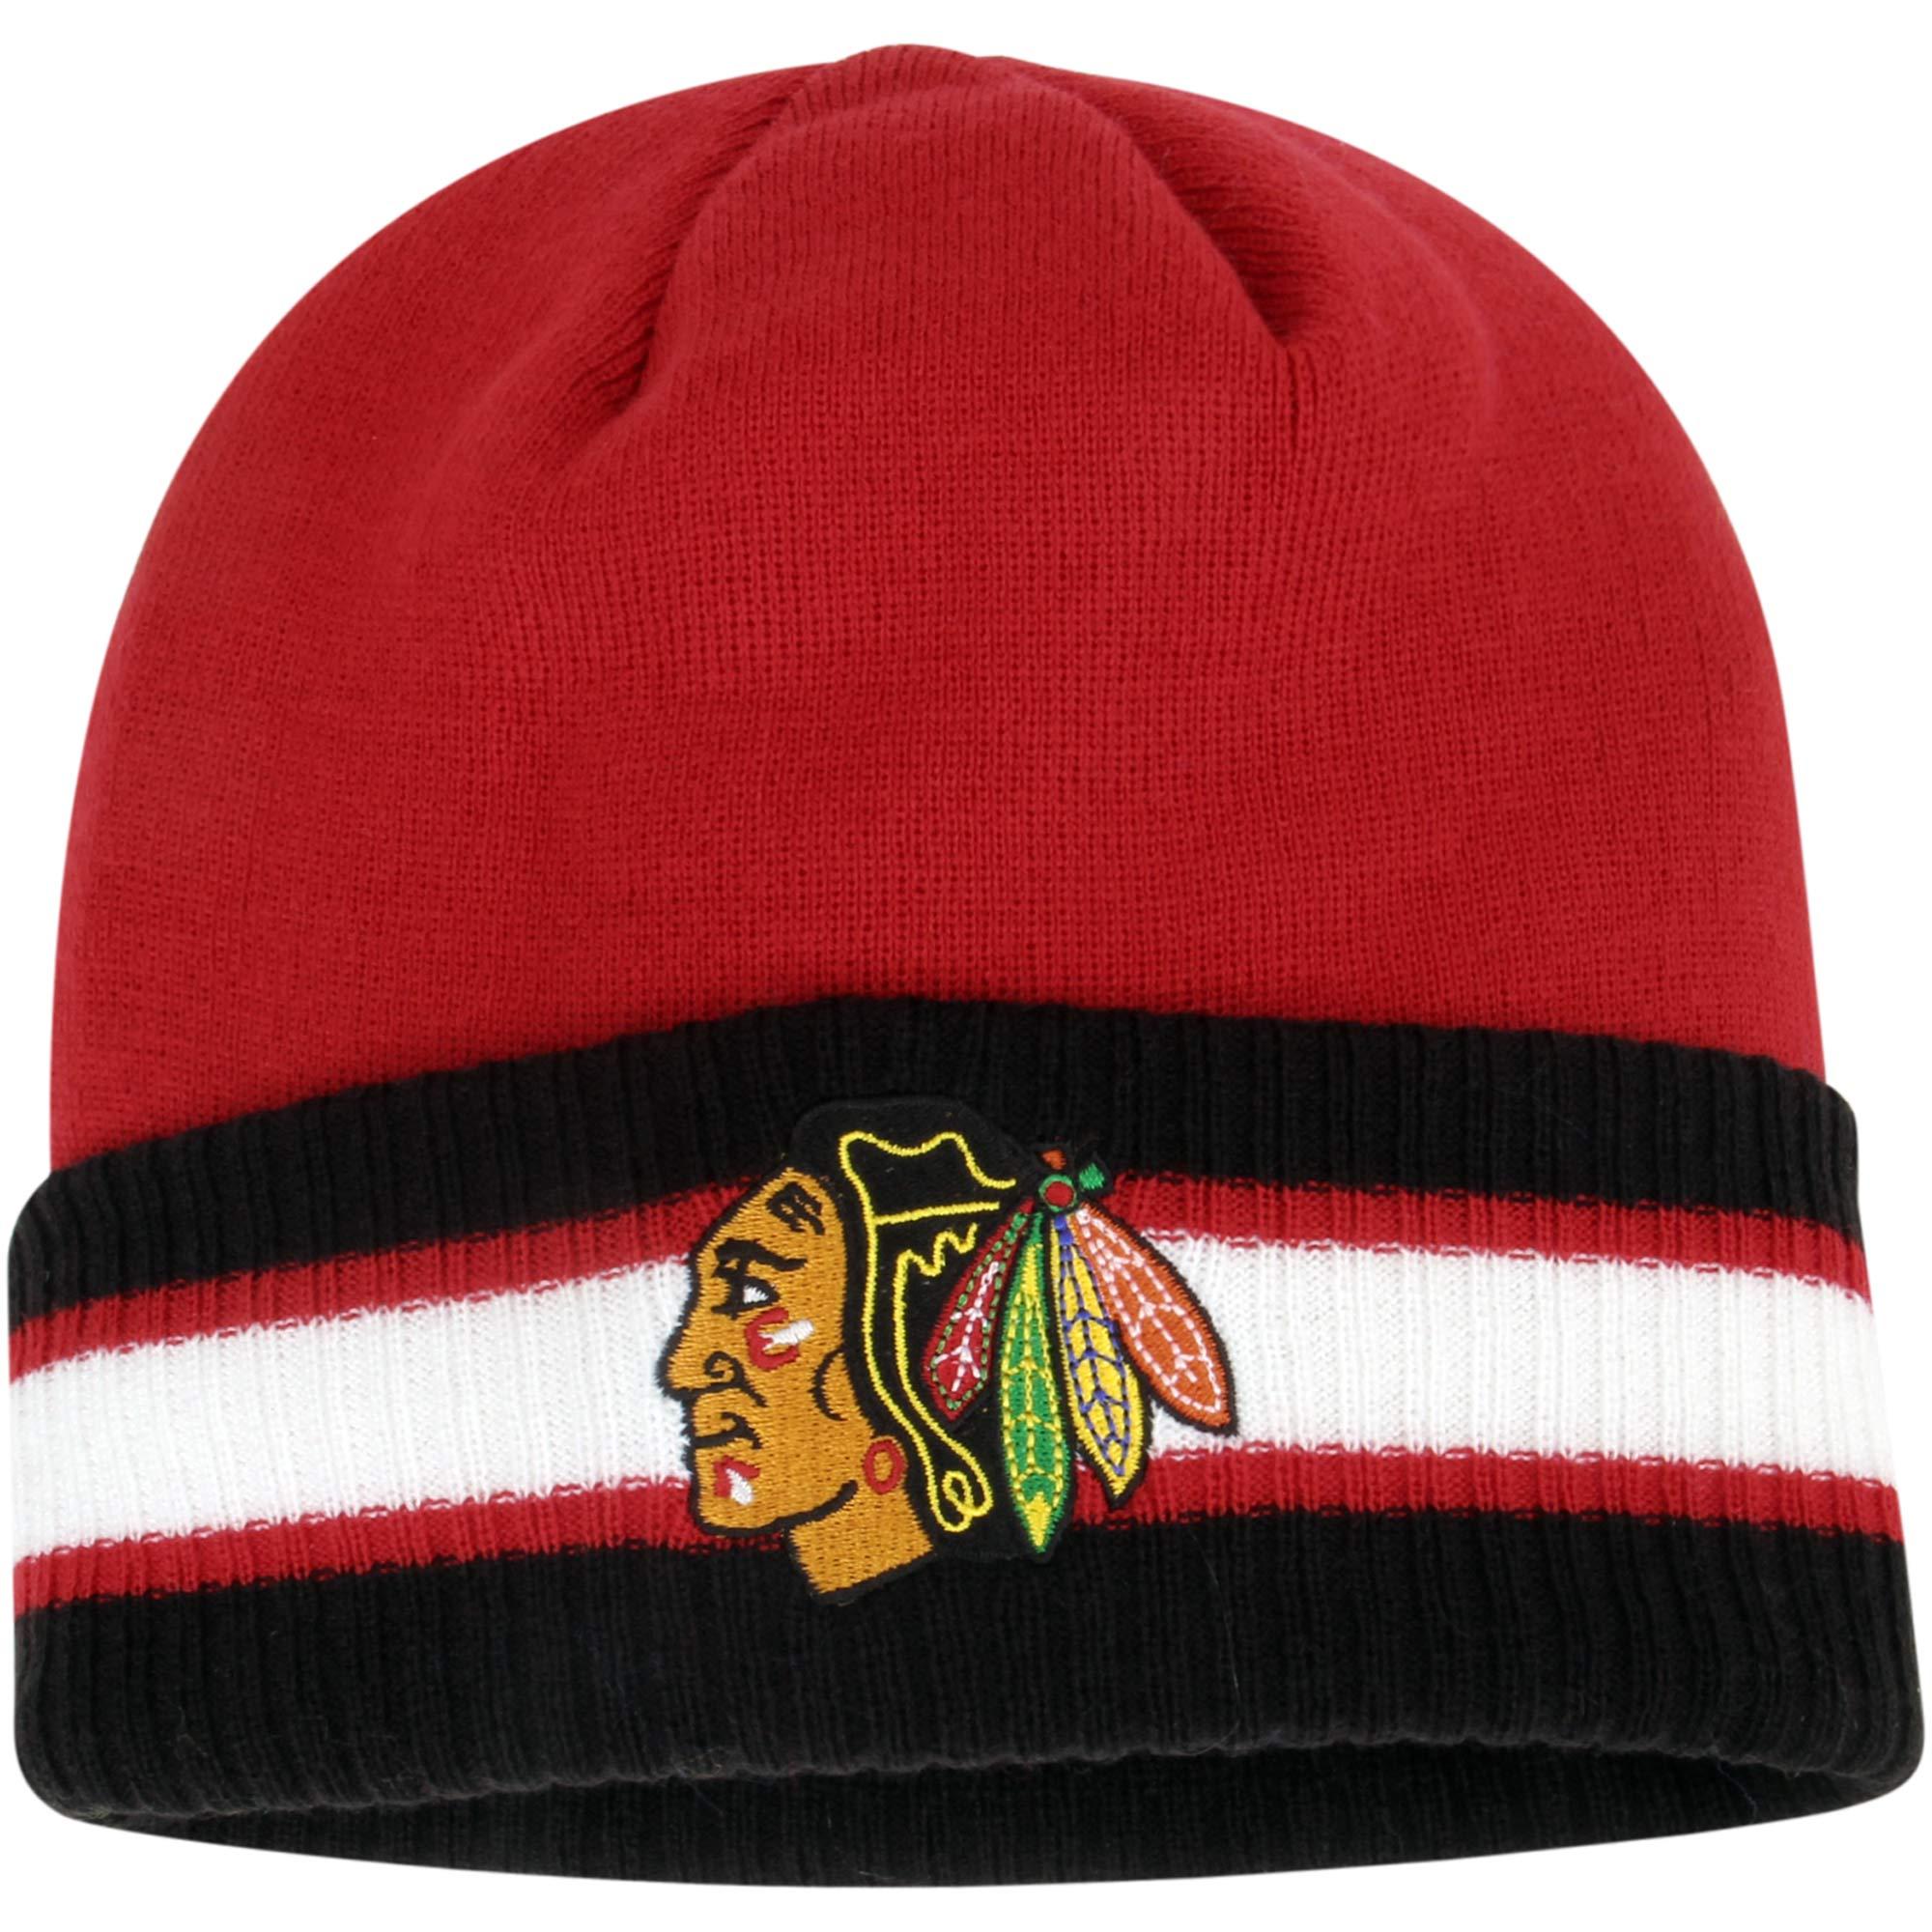 Chicago Blackhawks Reebok Captain's Cuffed Knit Hat - Red/Black - OSFA